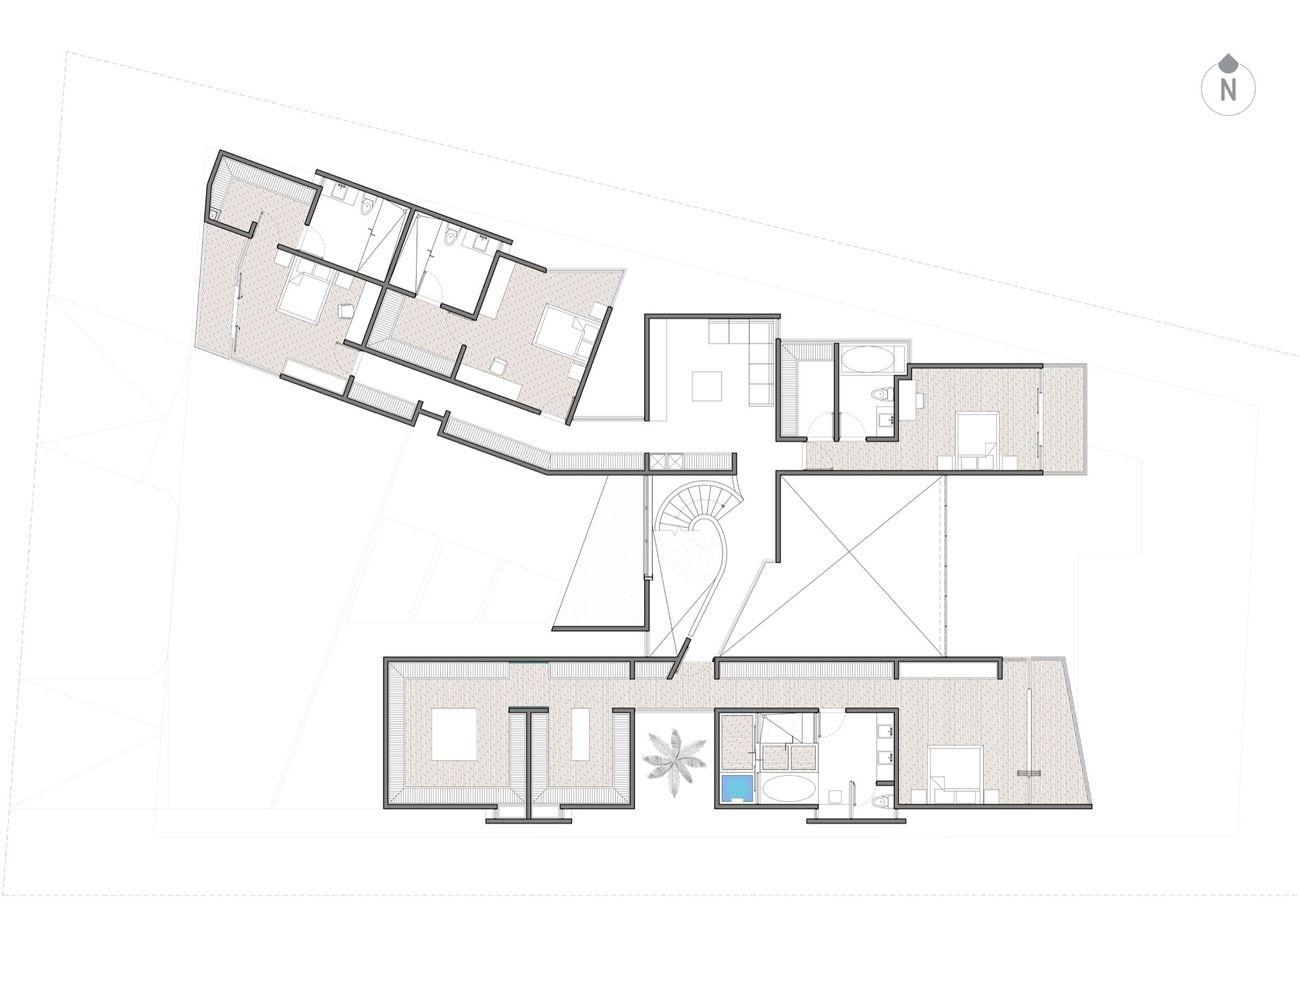 Galeria de resid ncia claroscuro roblesarq 18 - Residencia de manila swimming pool ...